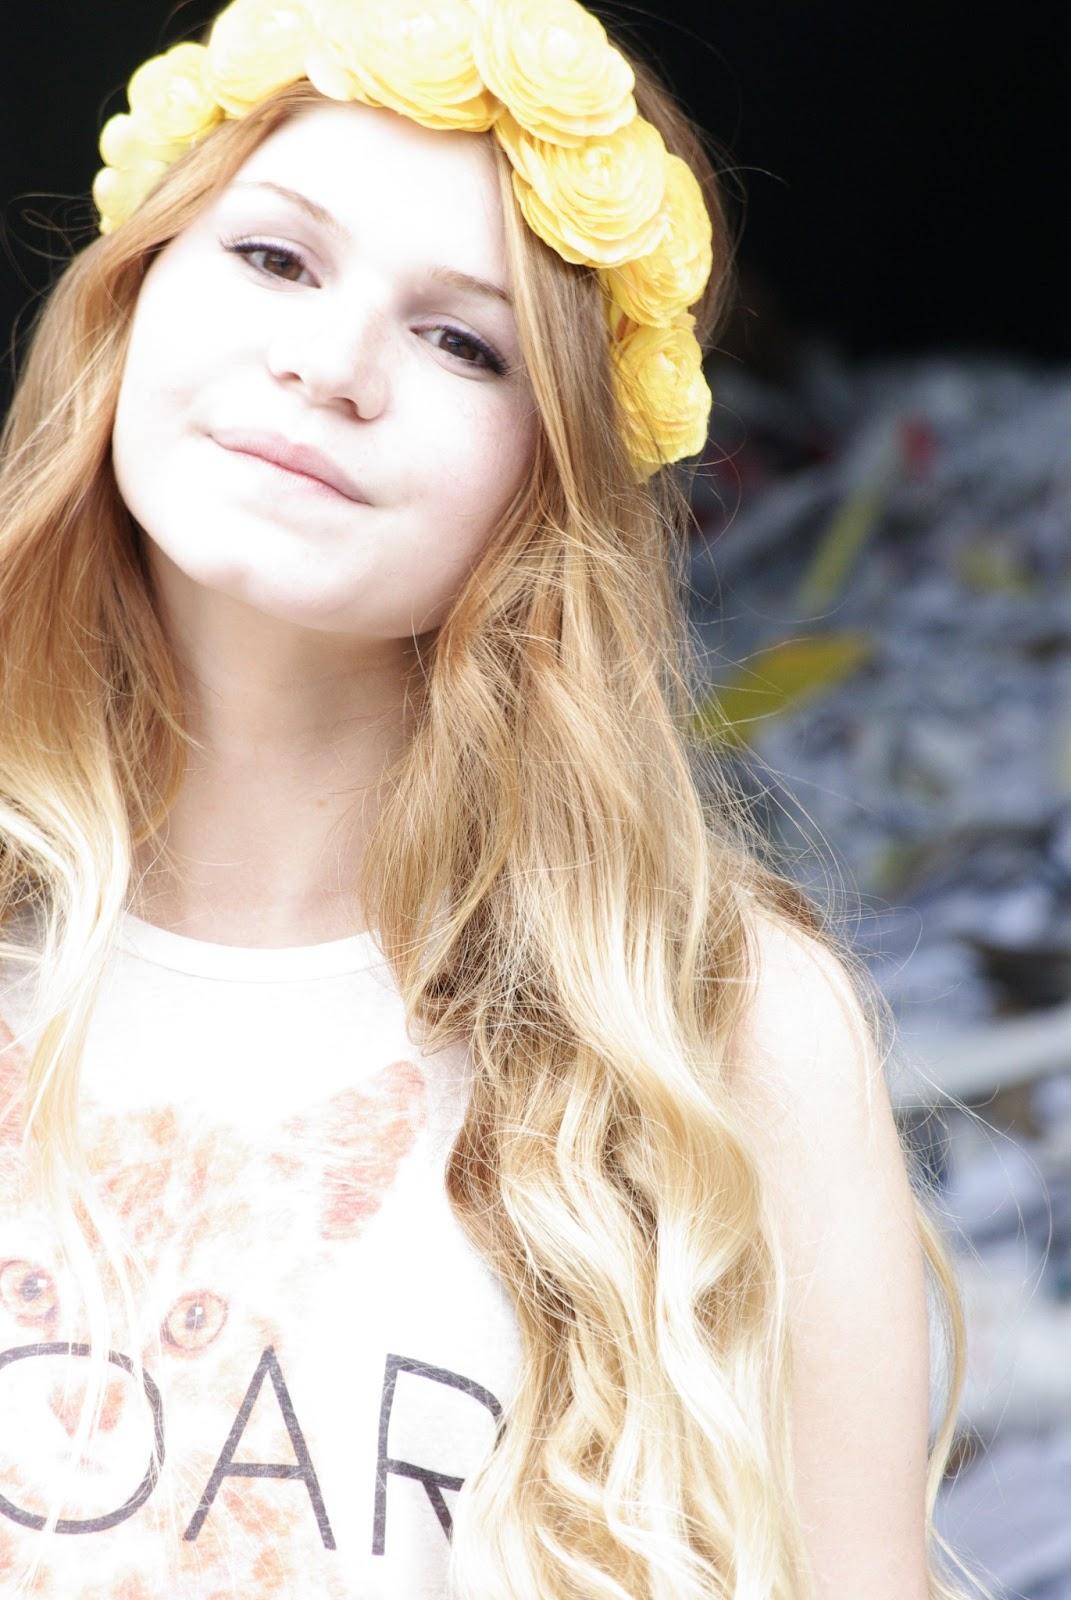 floral headbands tumblr - photo #30